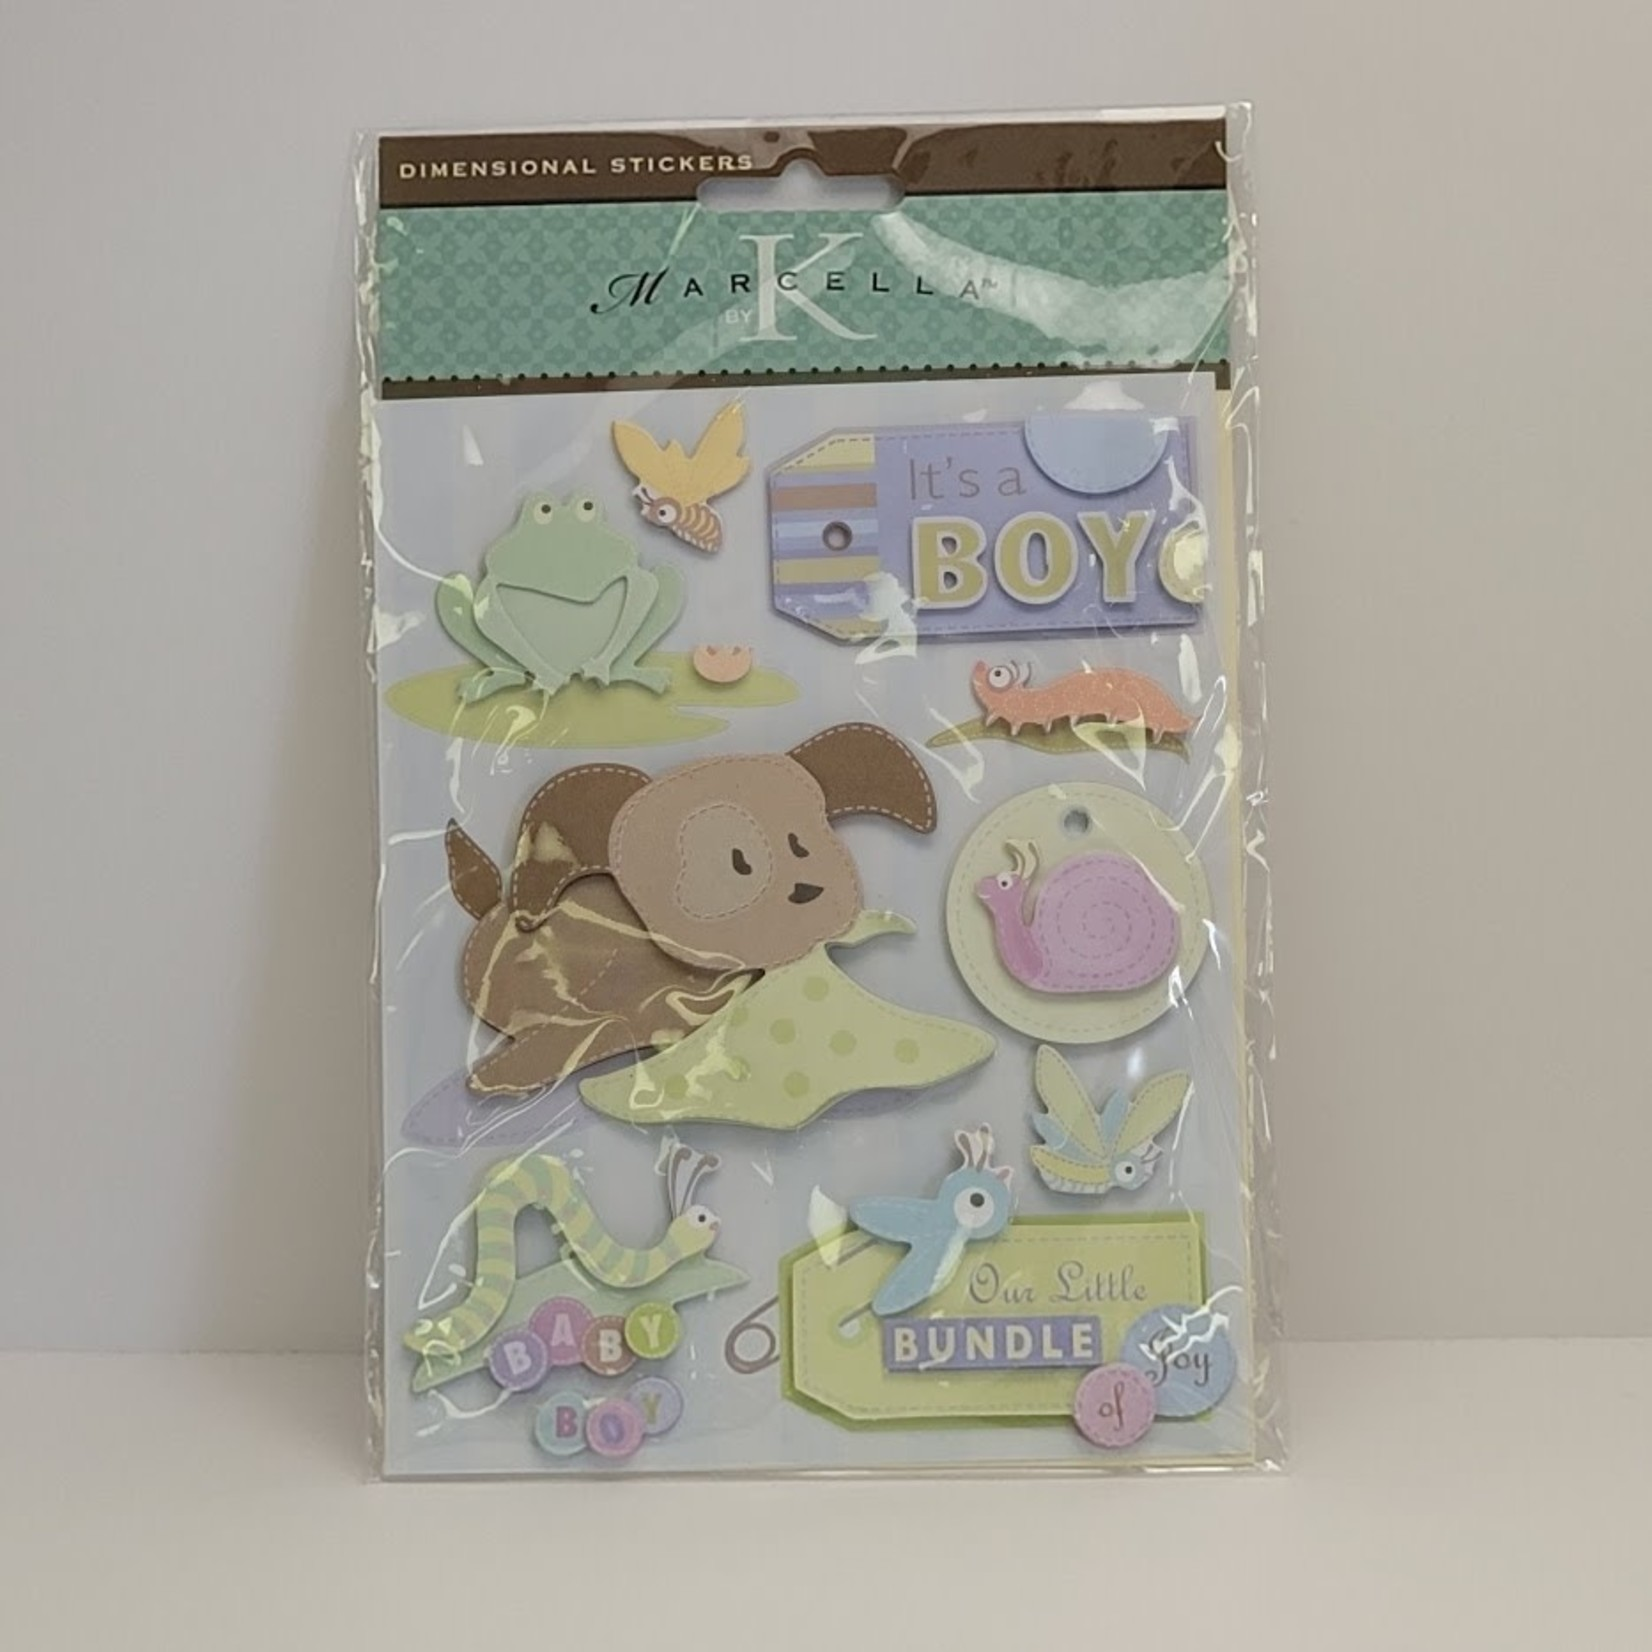 Dimensional Stickers - It's a Boy